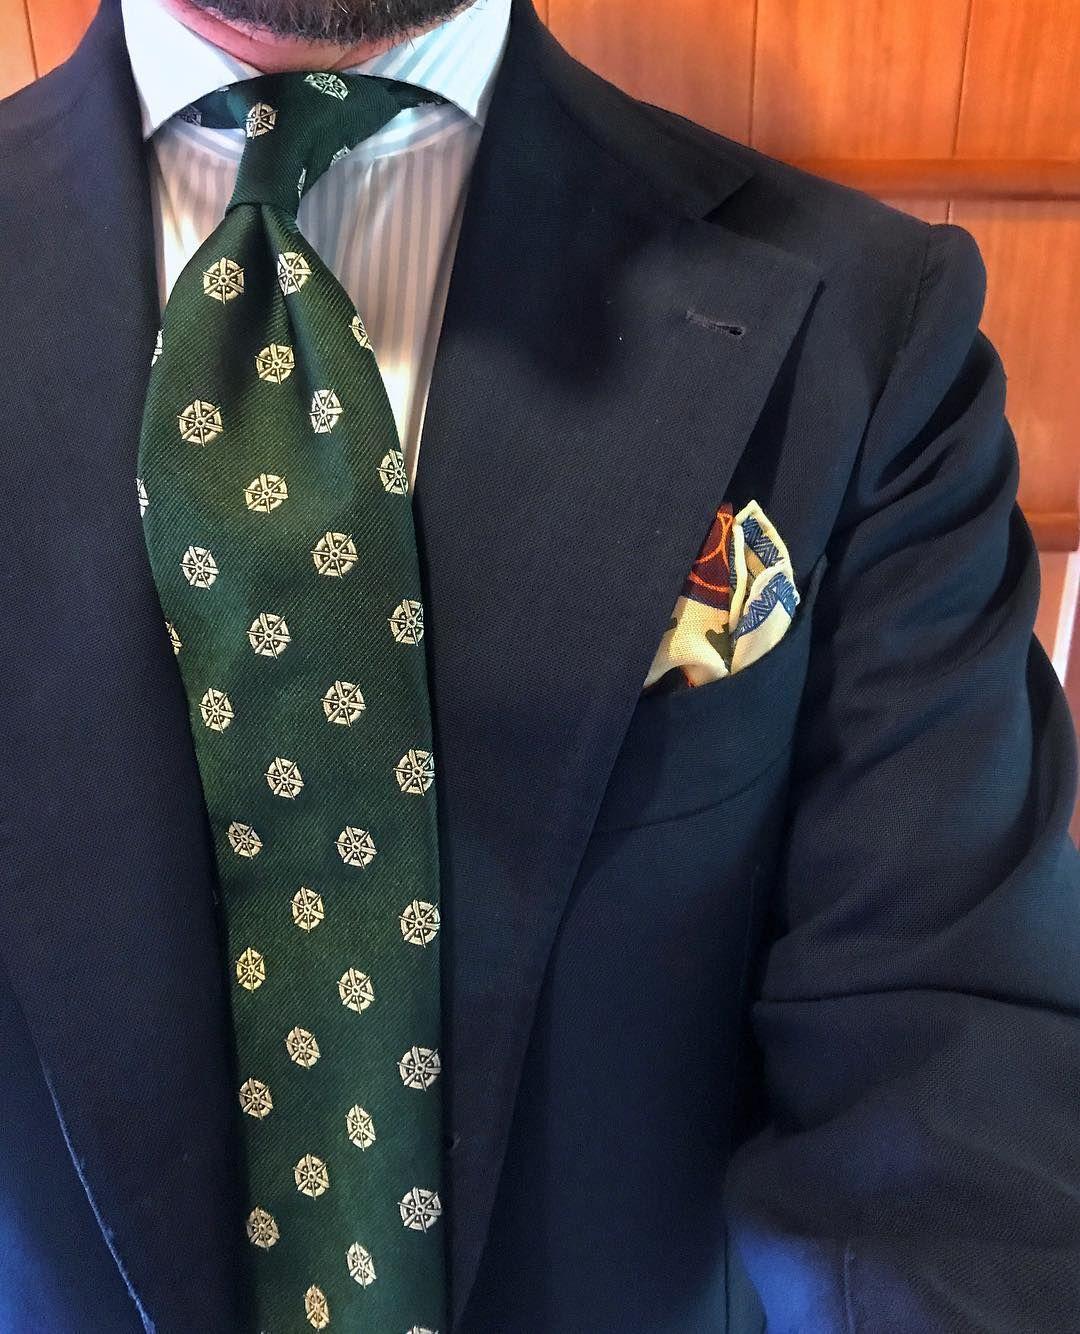 Benedikt Fries On Instagram Bottle Green Kyoto Crest Silk Tie And Our Cream Samurai Motif Pocket Square Shibumi Moda Uomo Abiti Uomo Moda